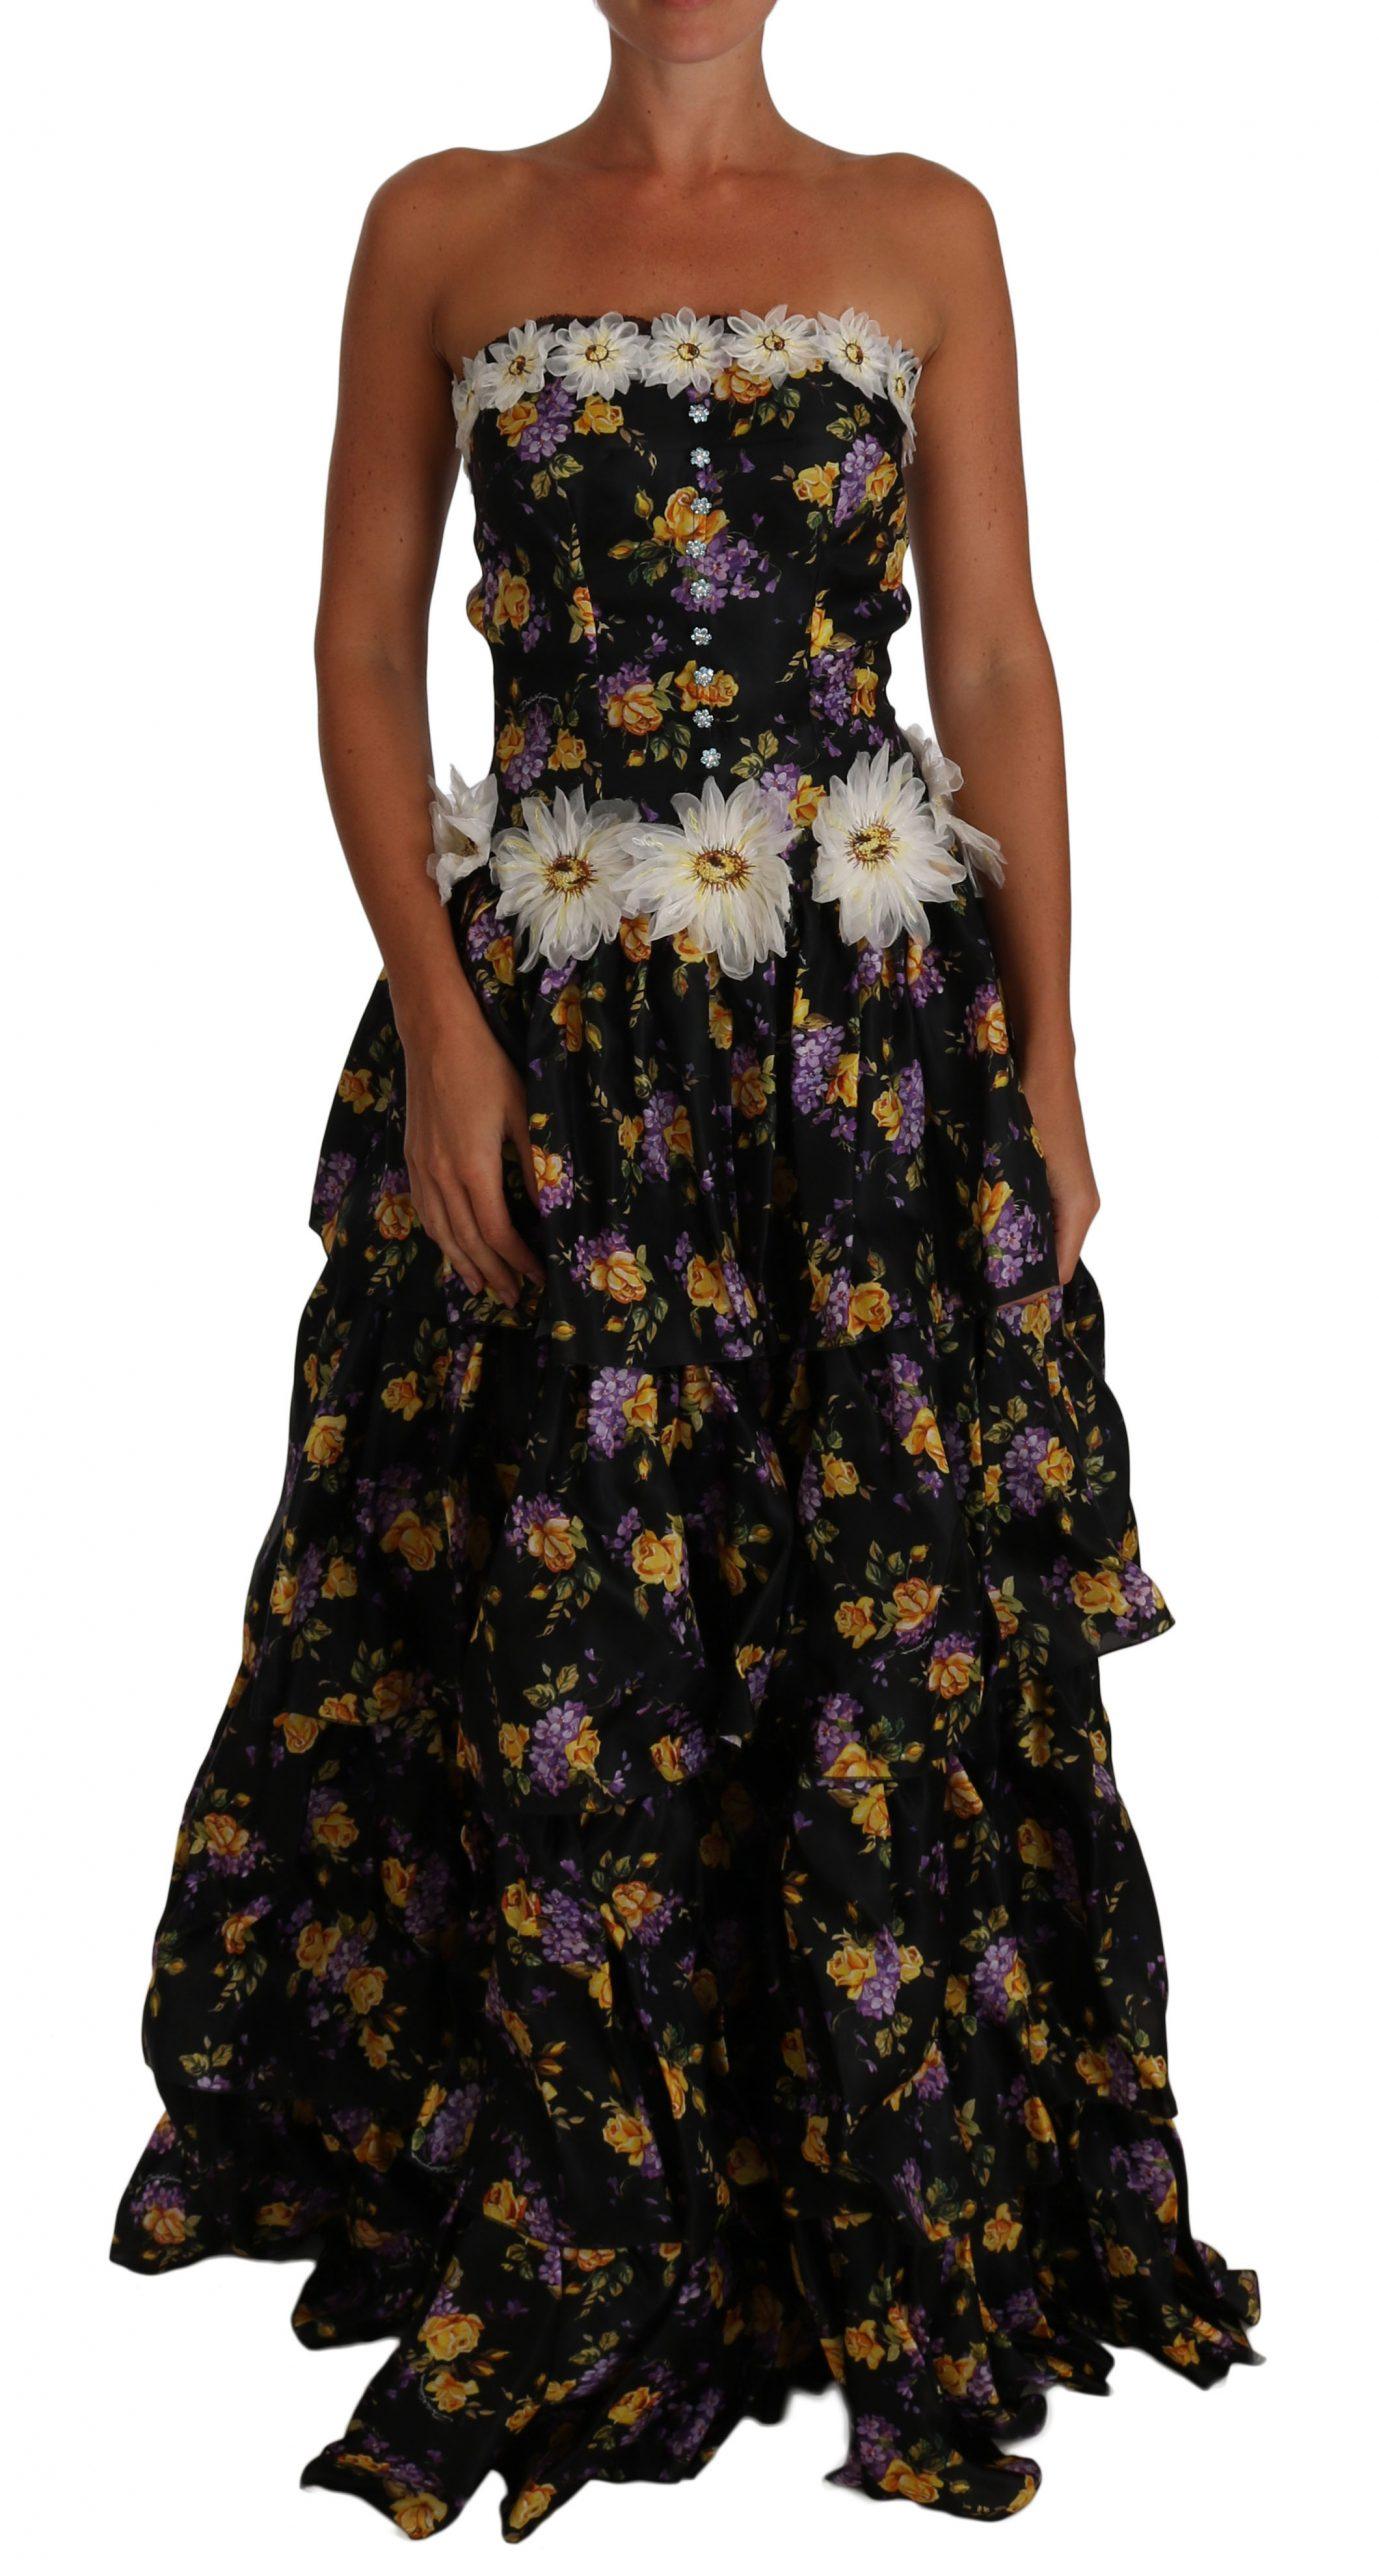 Dolce & Gabbana Women's Sartoria Ball Floral Crystal Dress DR1074 - IT36 | S